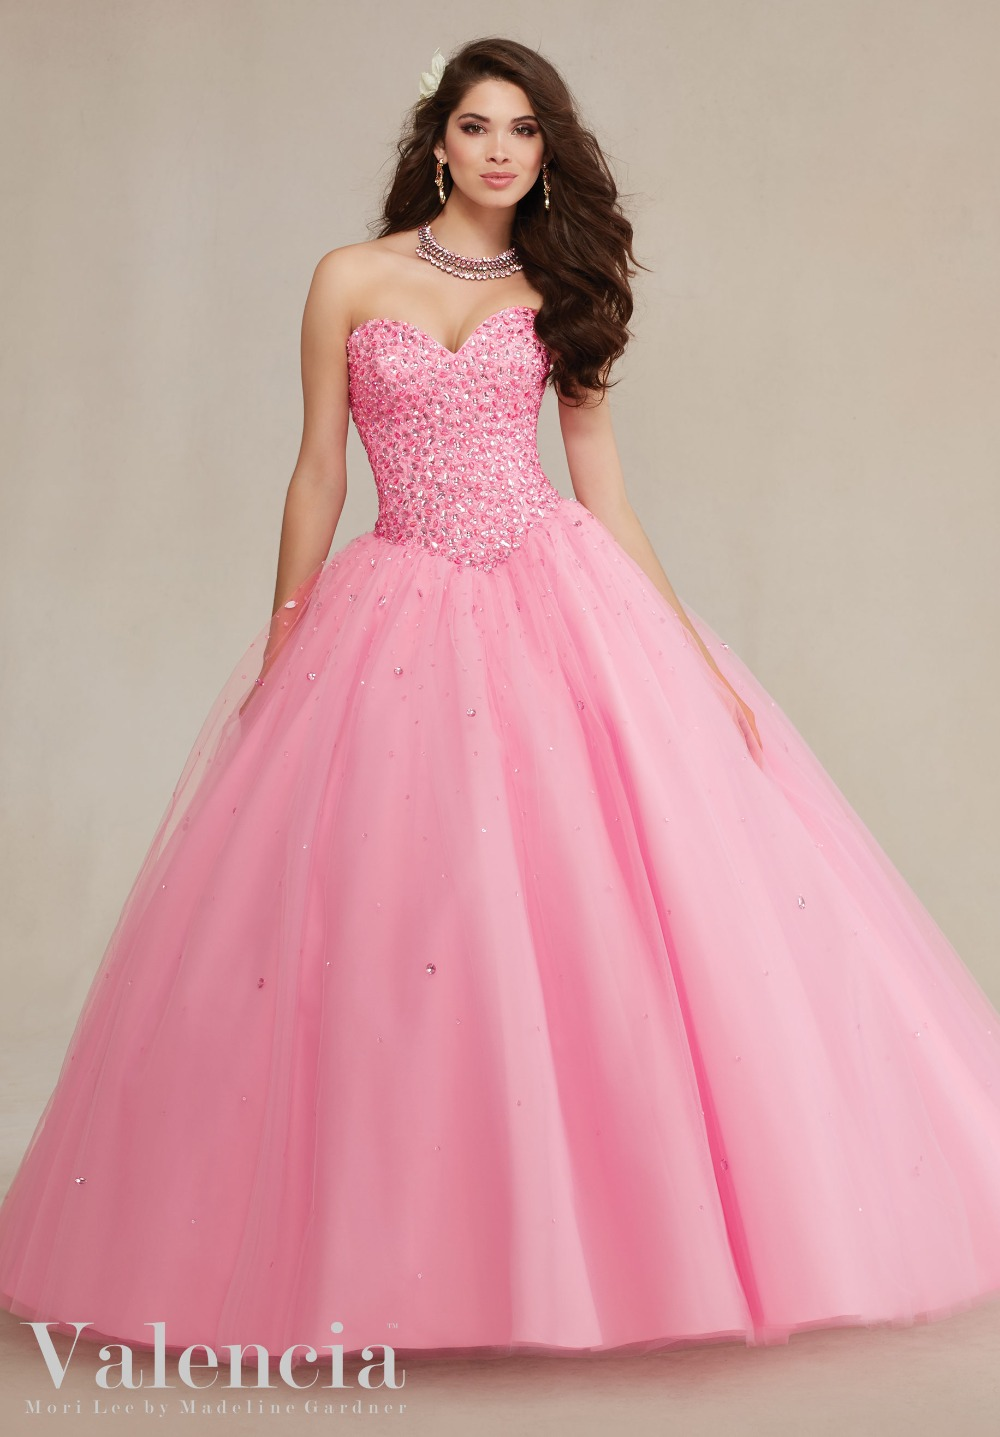 Fantástico Vestidos De Dama En Azul Real Modelo - Colección de ...